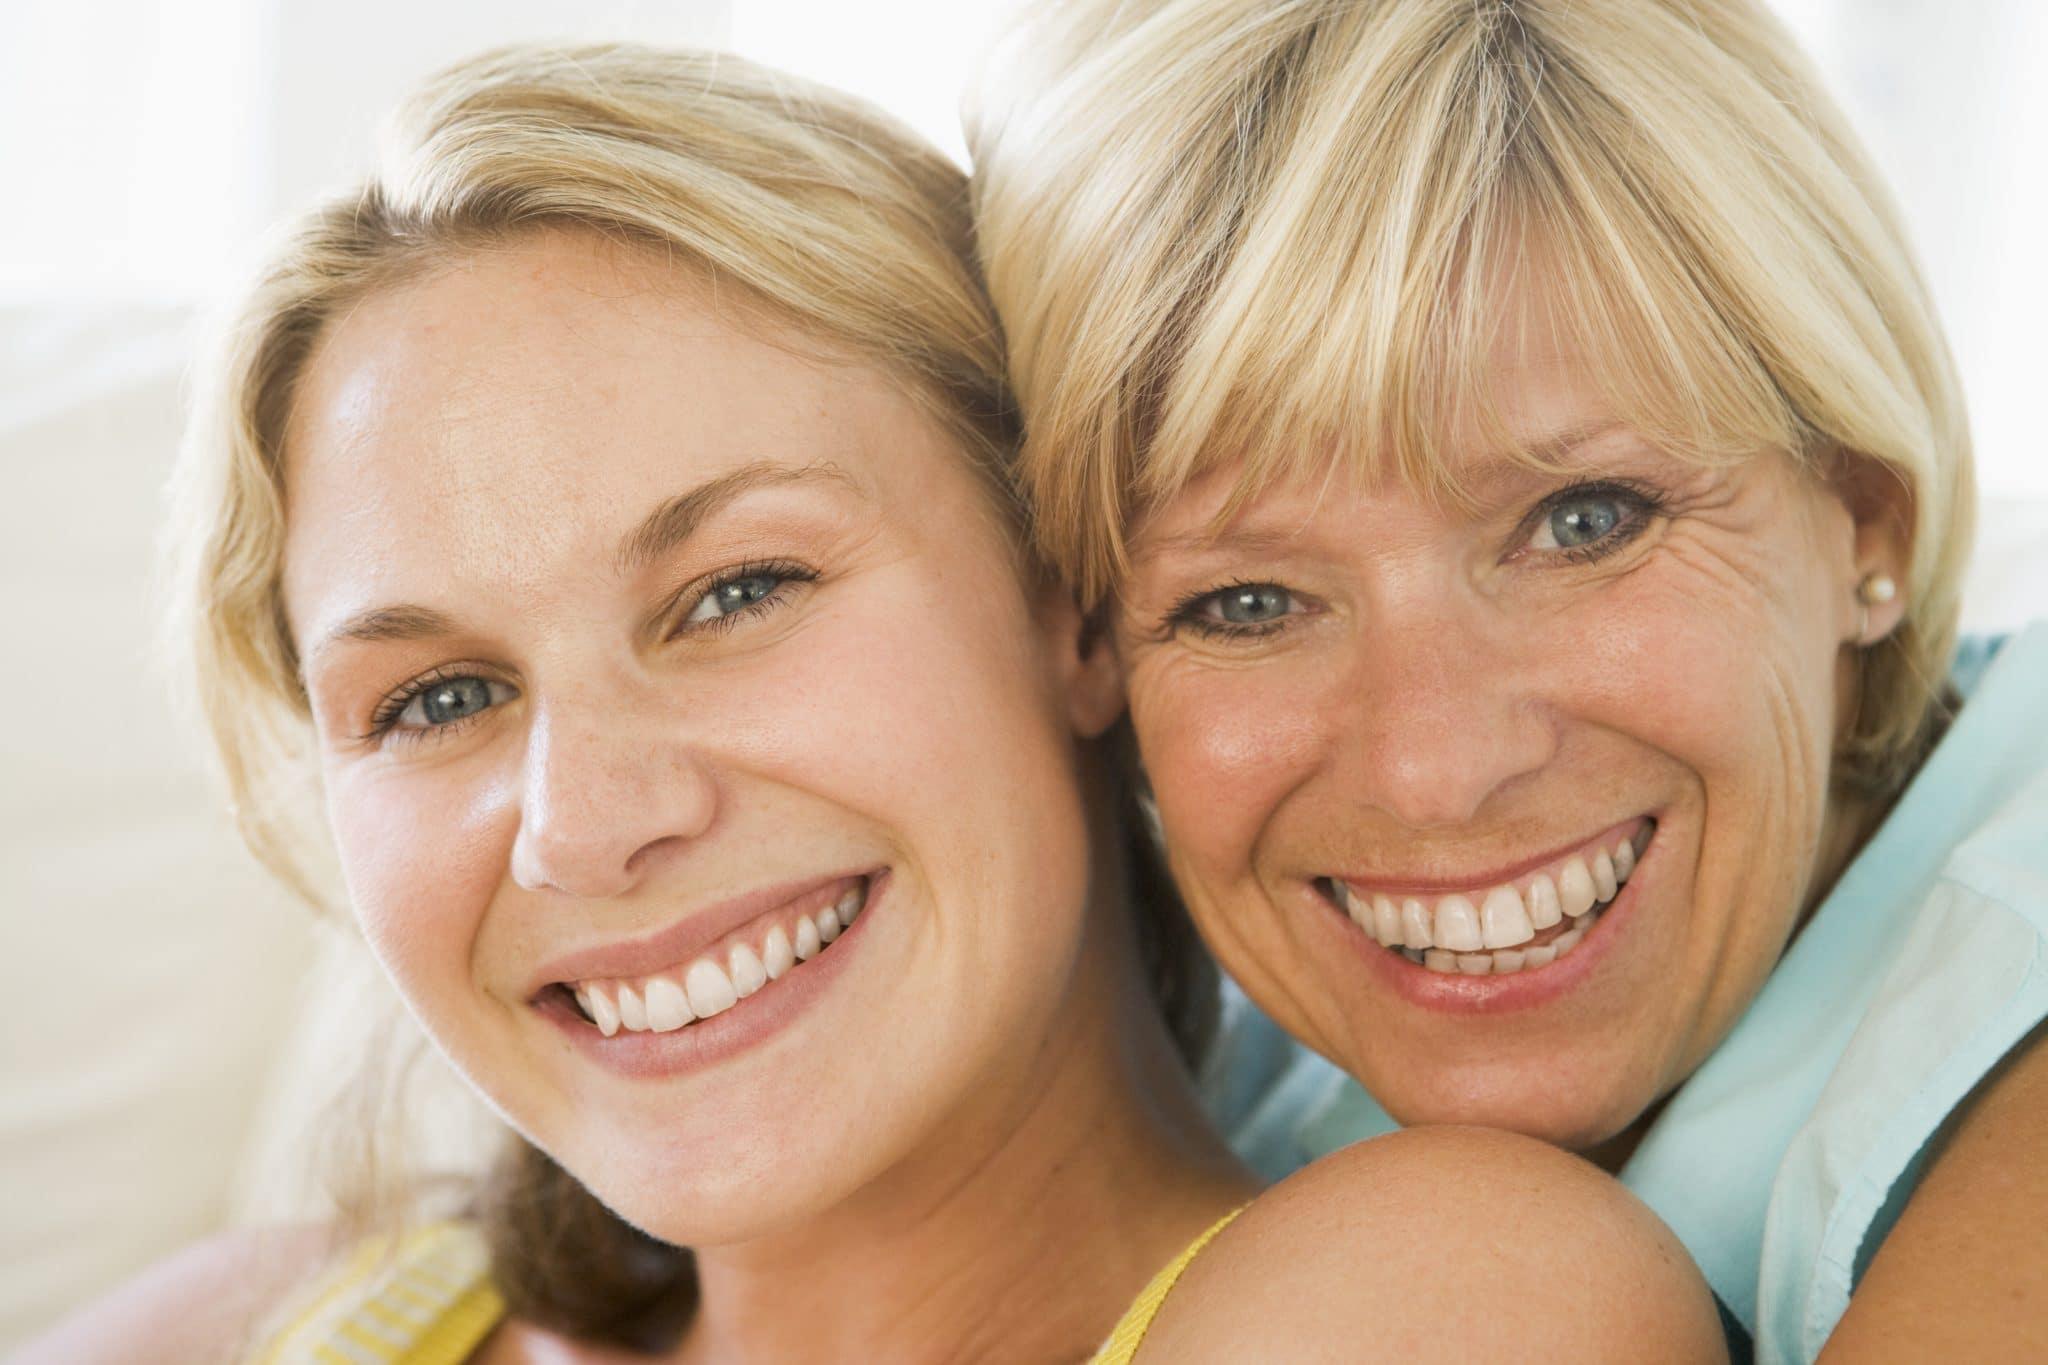 Female Medicine Optimized